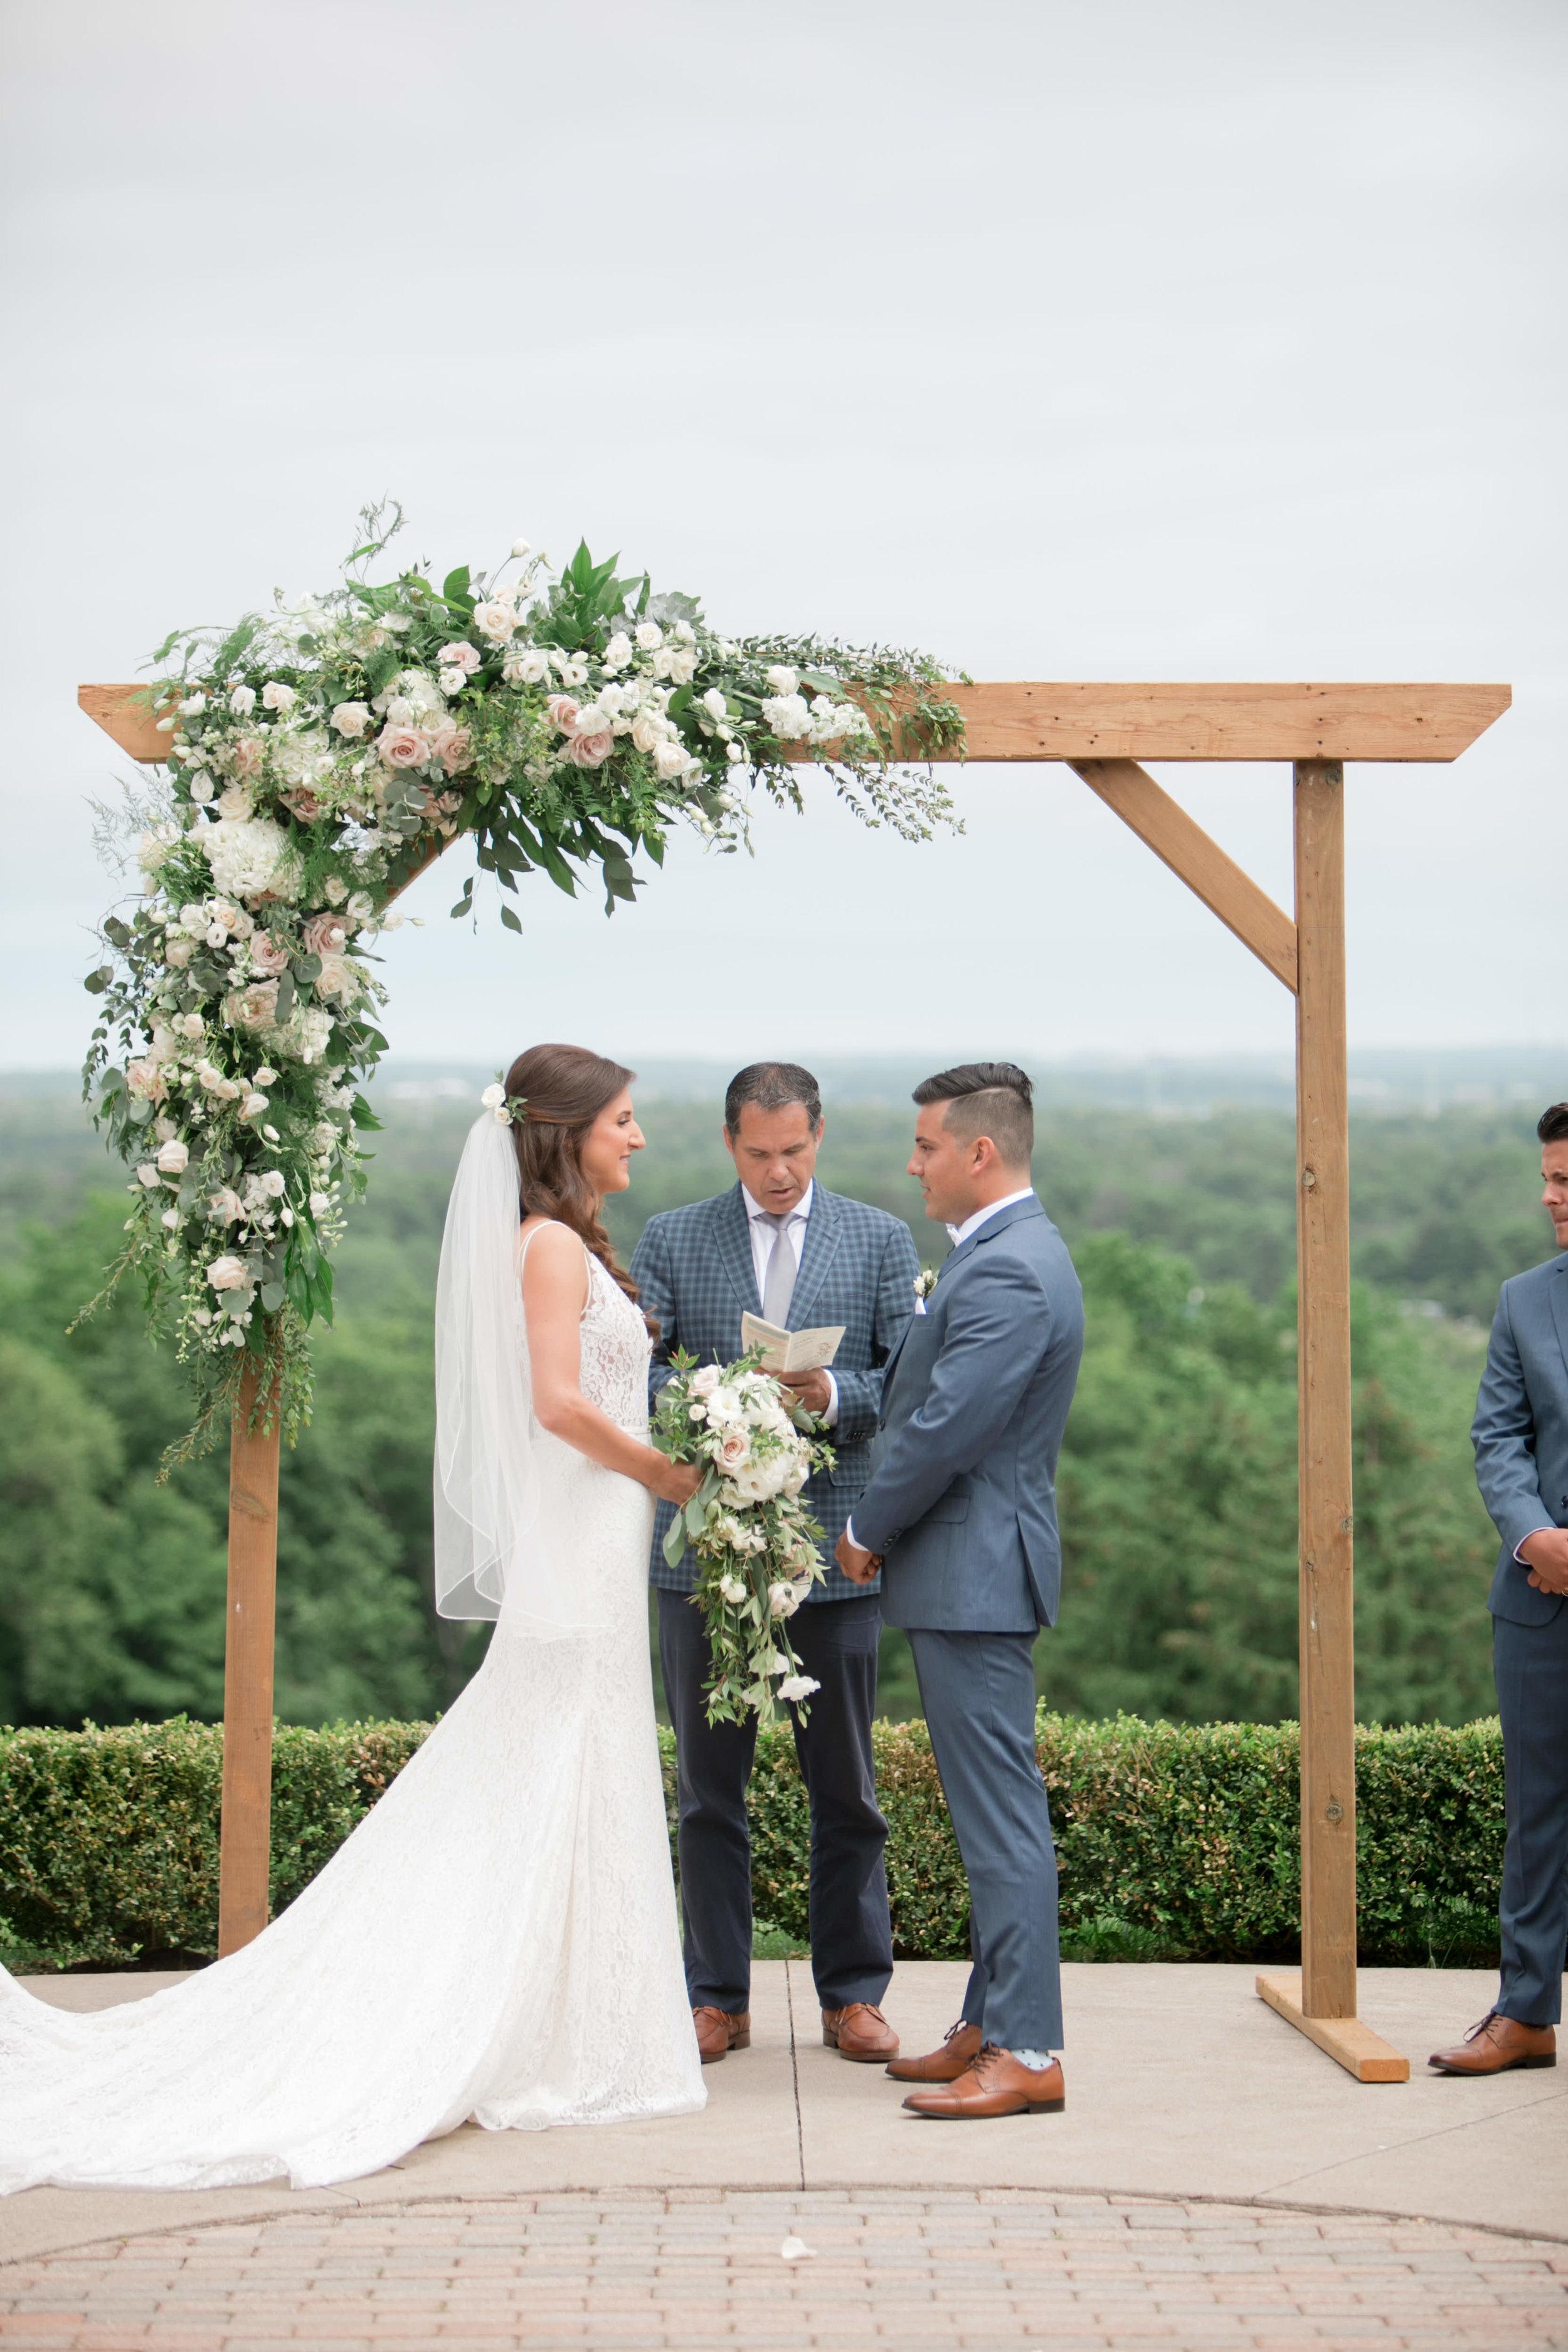 Miranda___Daniel___Daniel_Ricci_Weddings___High_Res._Finals_308.jpg